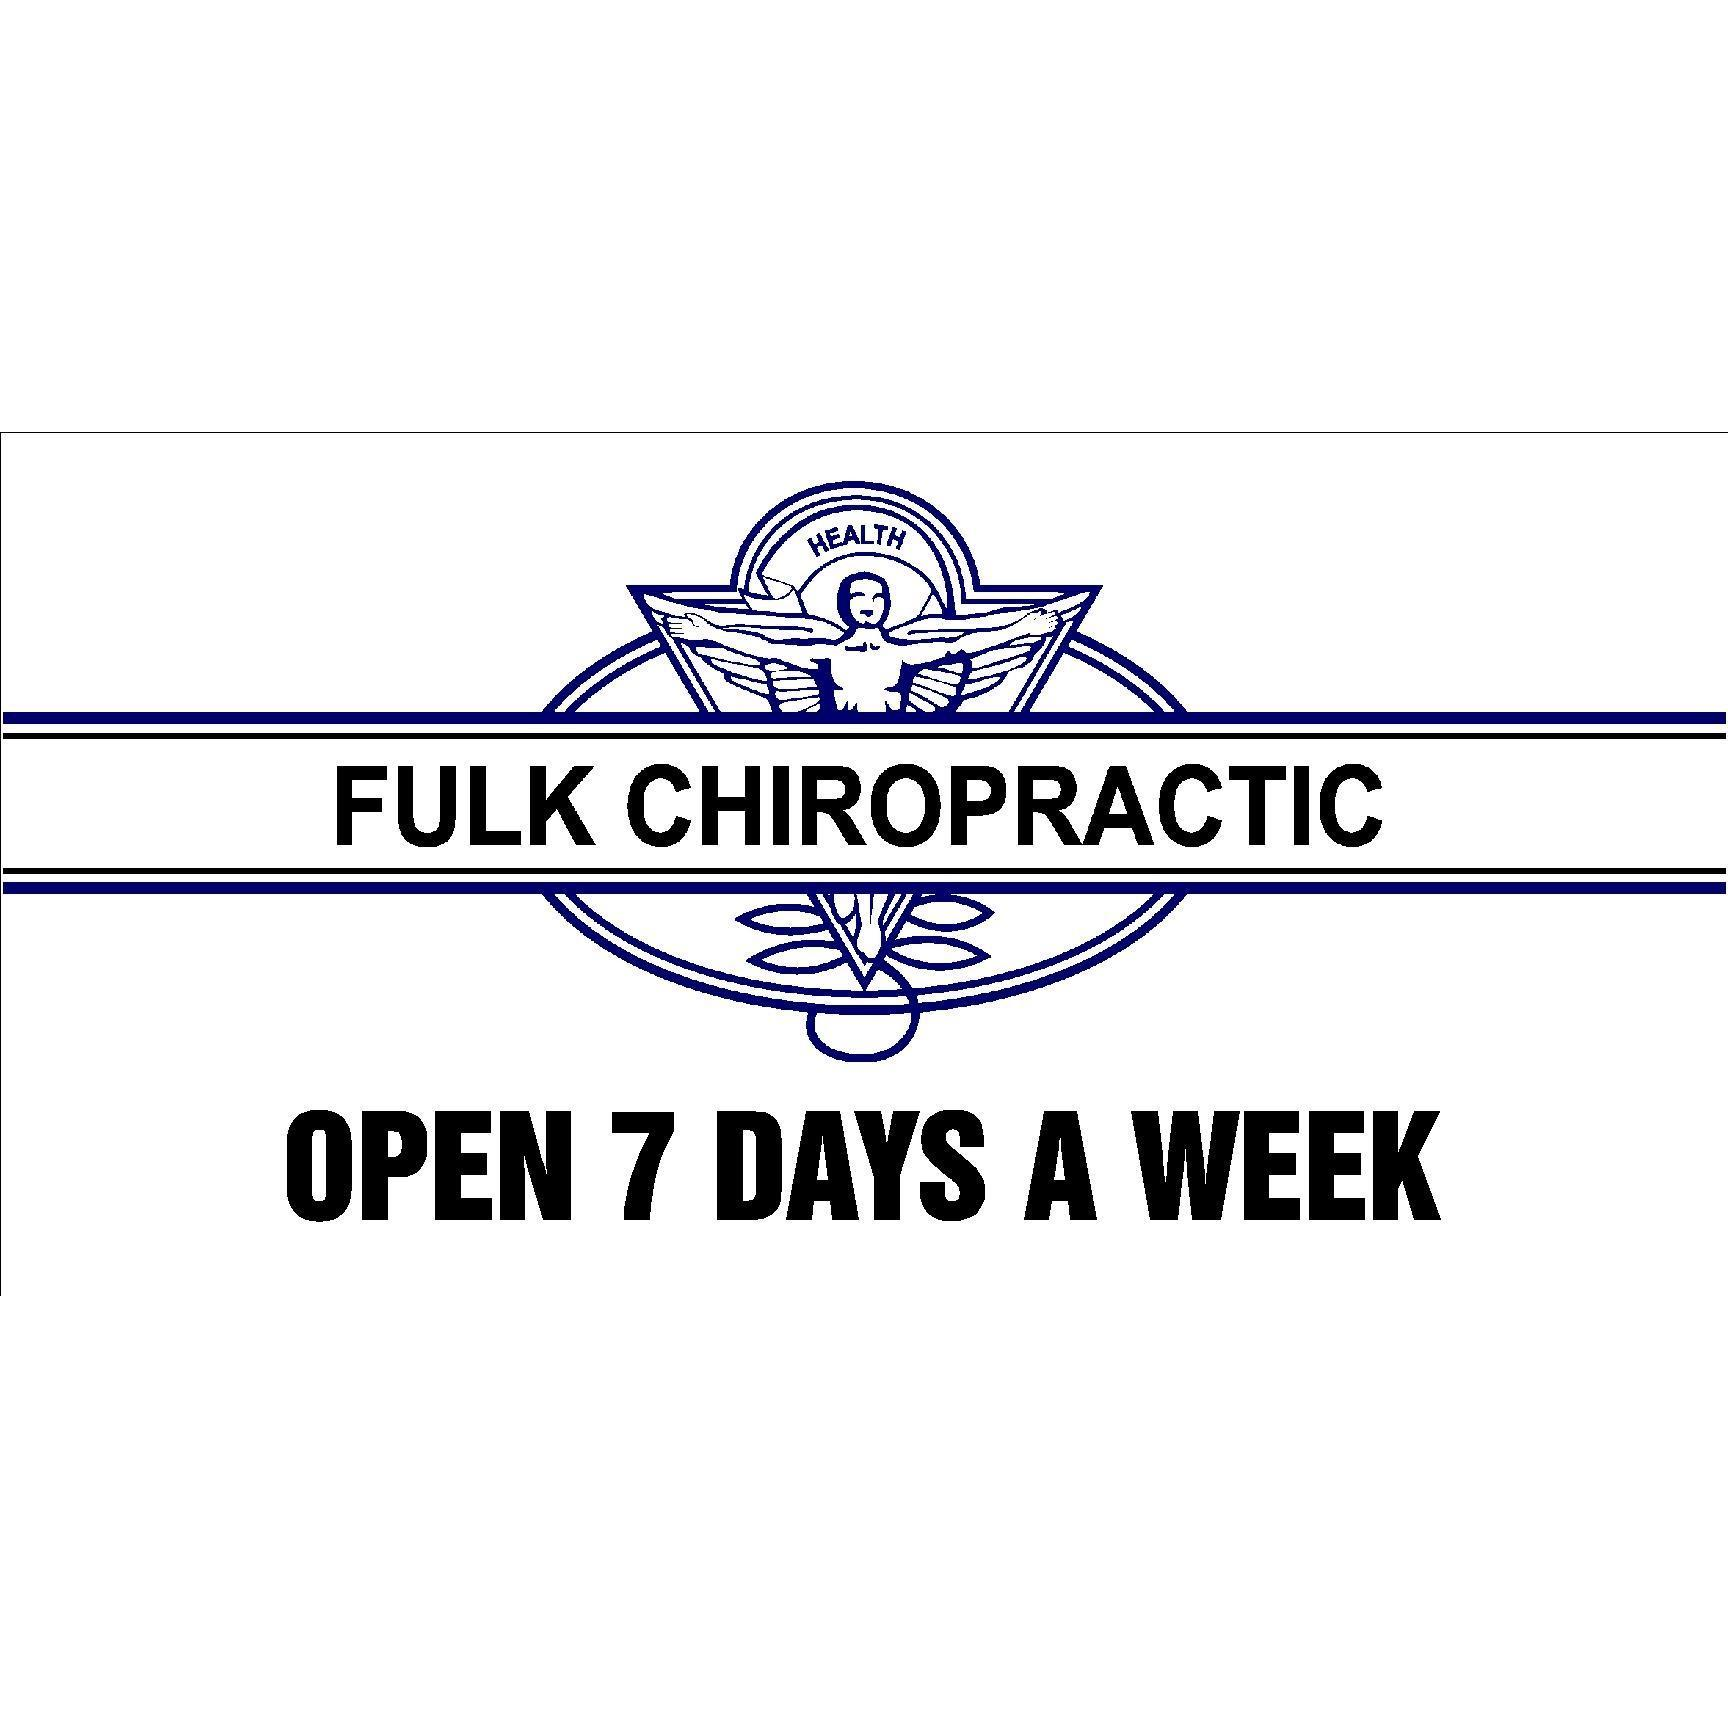 Fulk Chiropractic